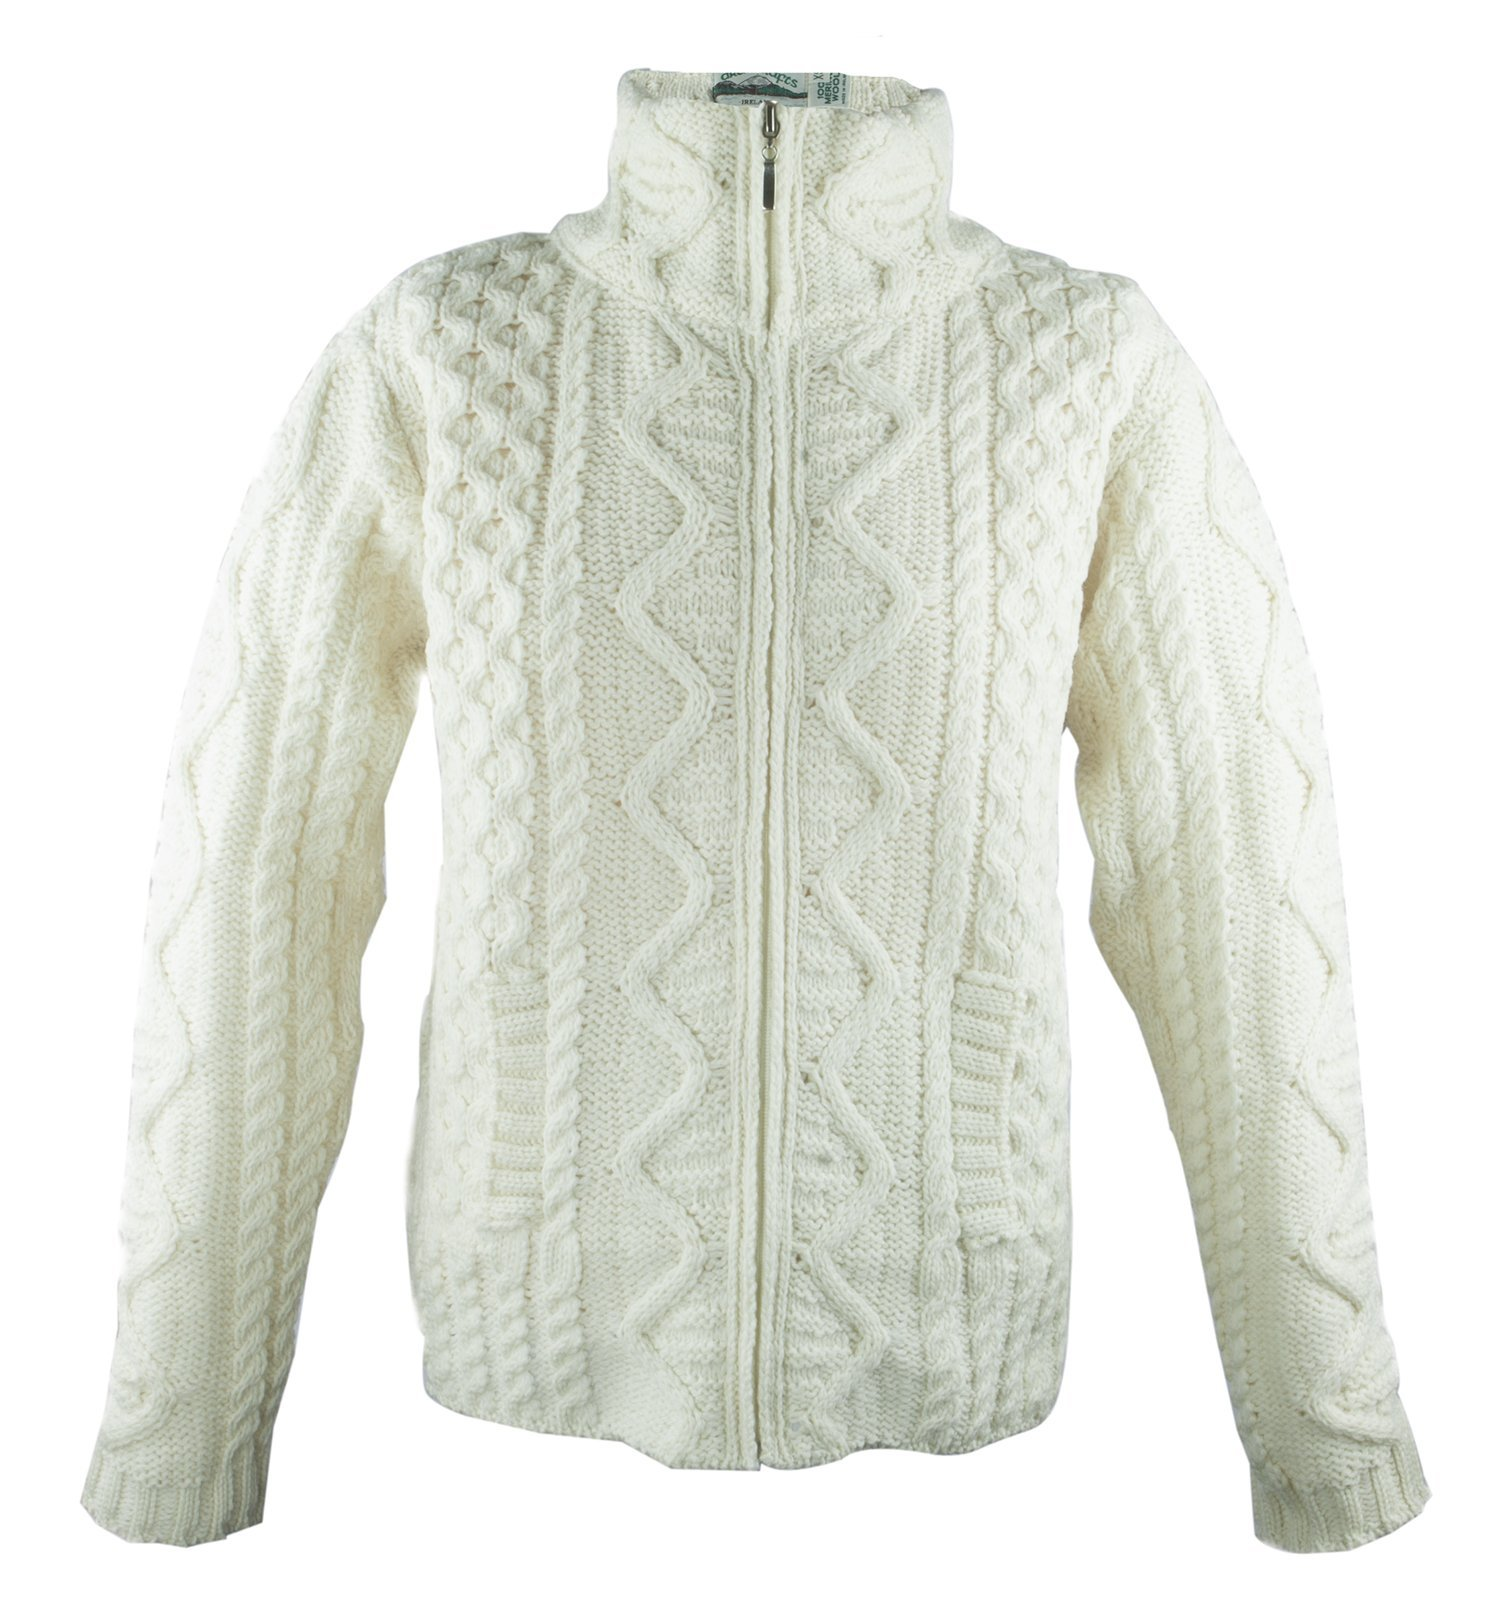 100% Irish Merino Wool Aran Knit Zip Sweater with pockets by West End Knitwear, Ecru, Medium